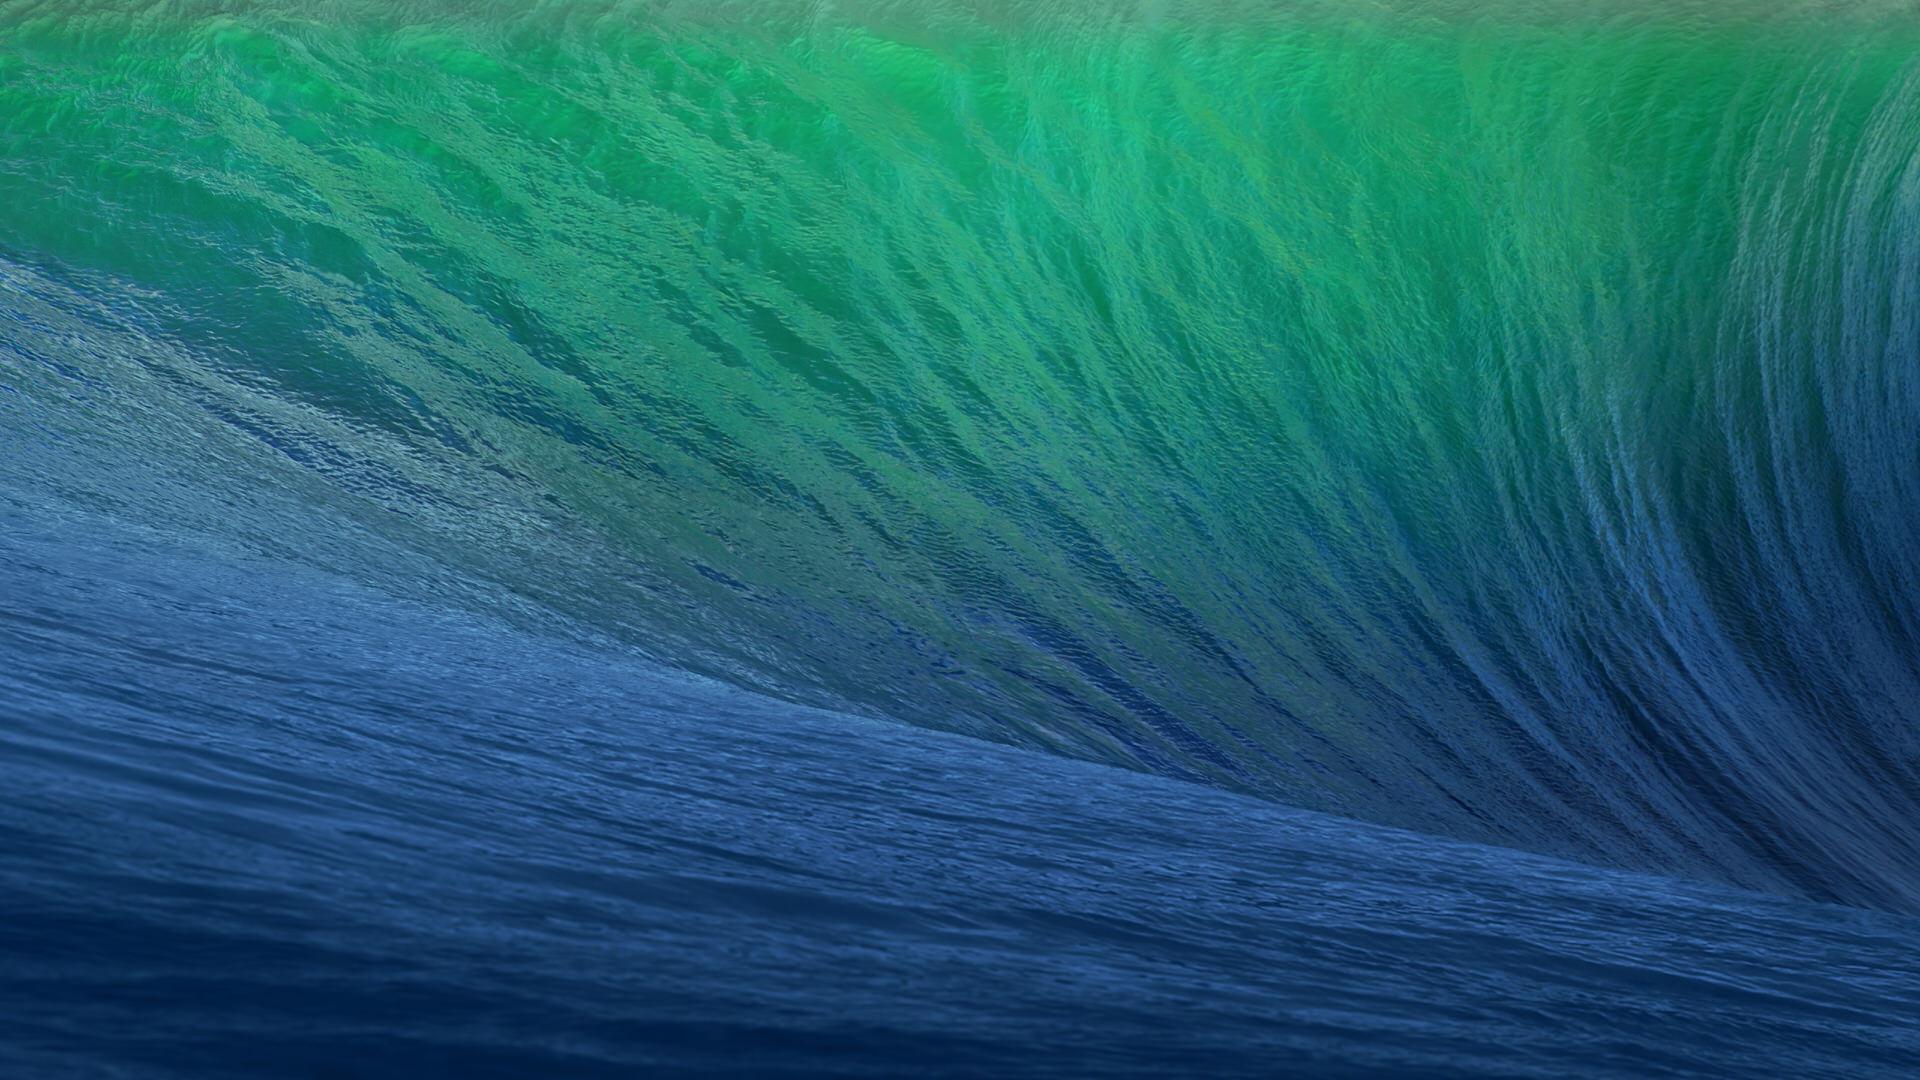 macOS Mavericks系统默认壁纸osx hero高清壁纸